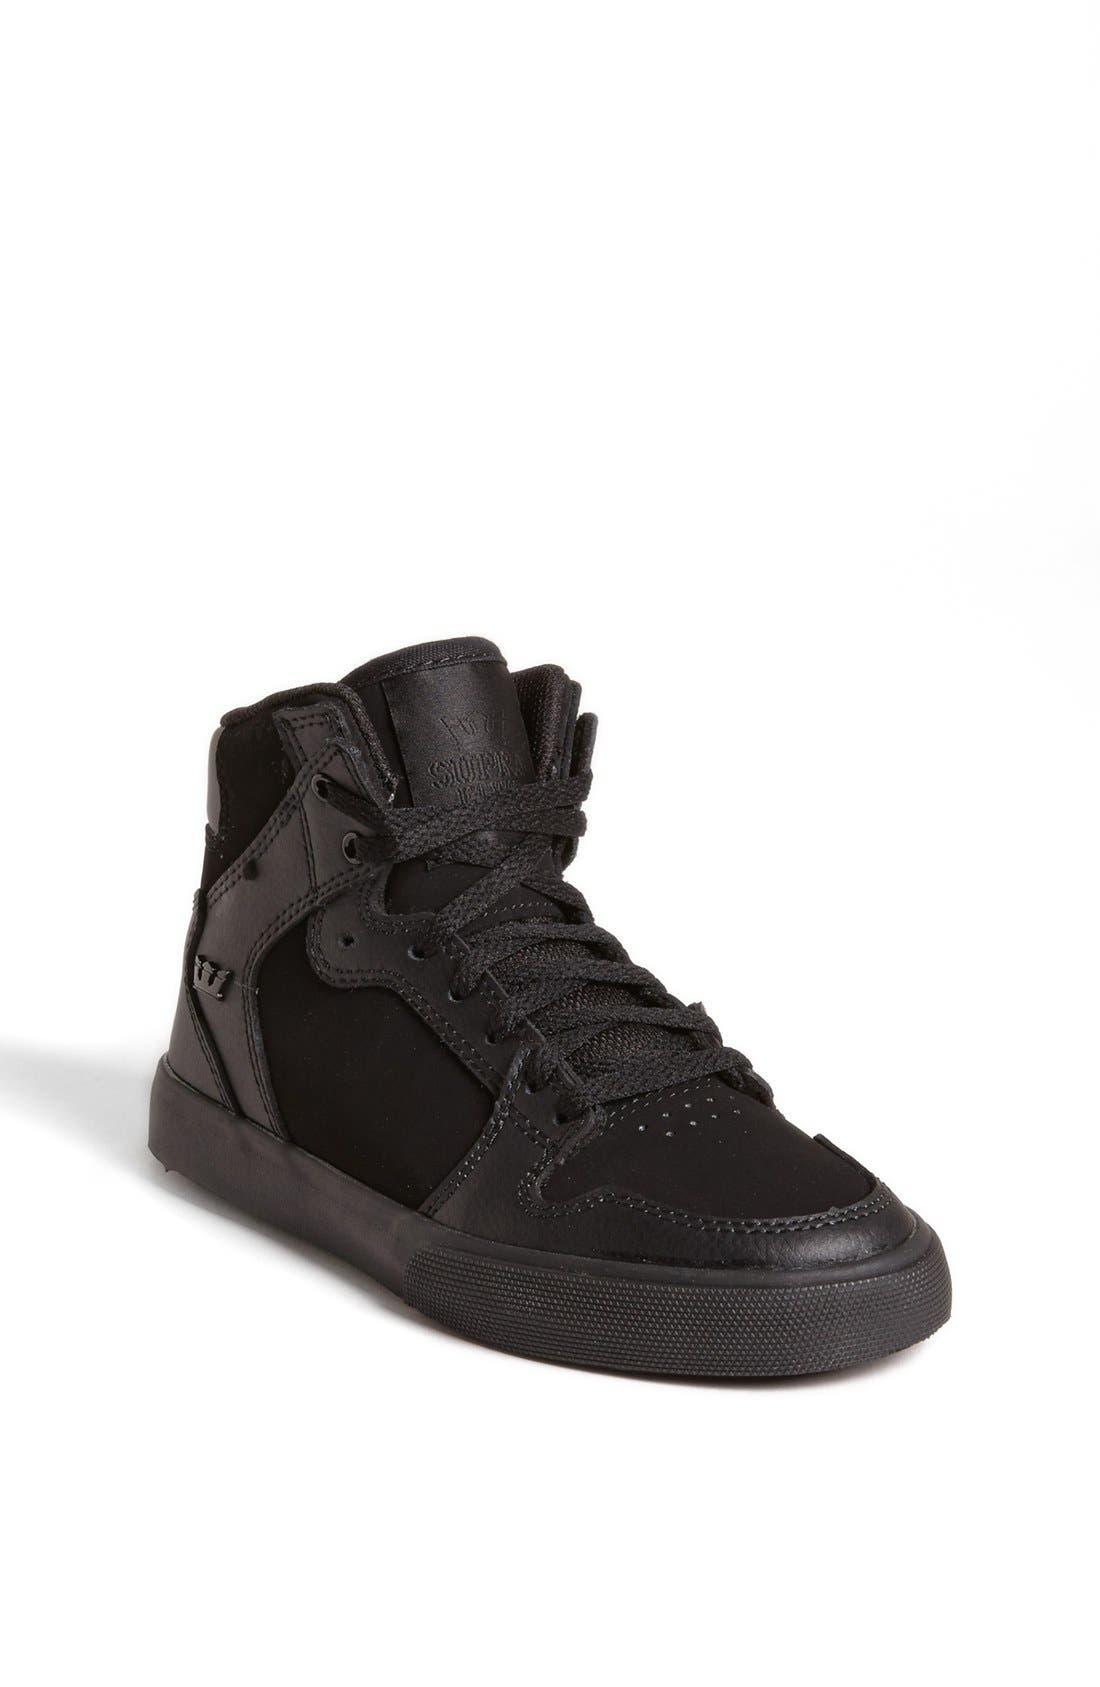 Alternate Image 1 Selected - Supra 'Vaider' Sneaker (Toddler, Little Kid & Big Kid)